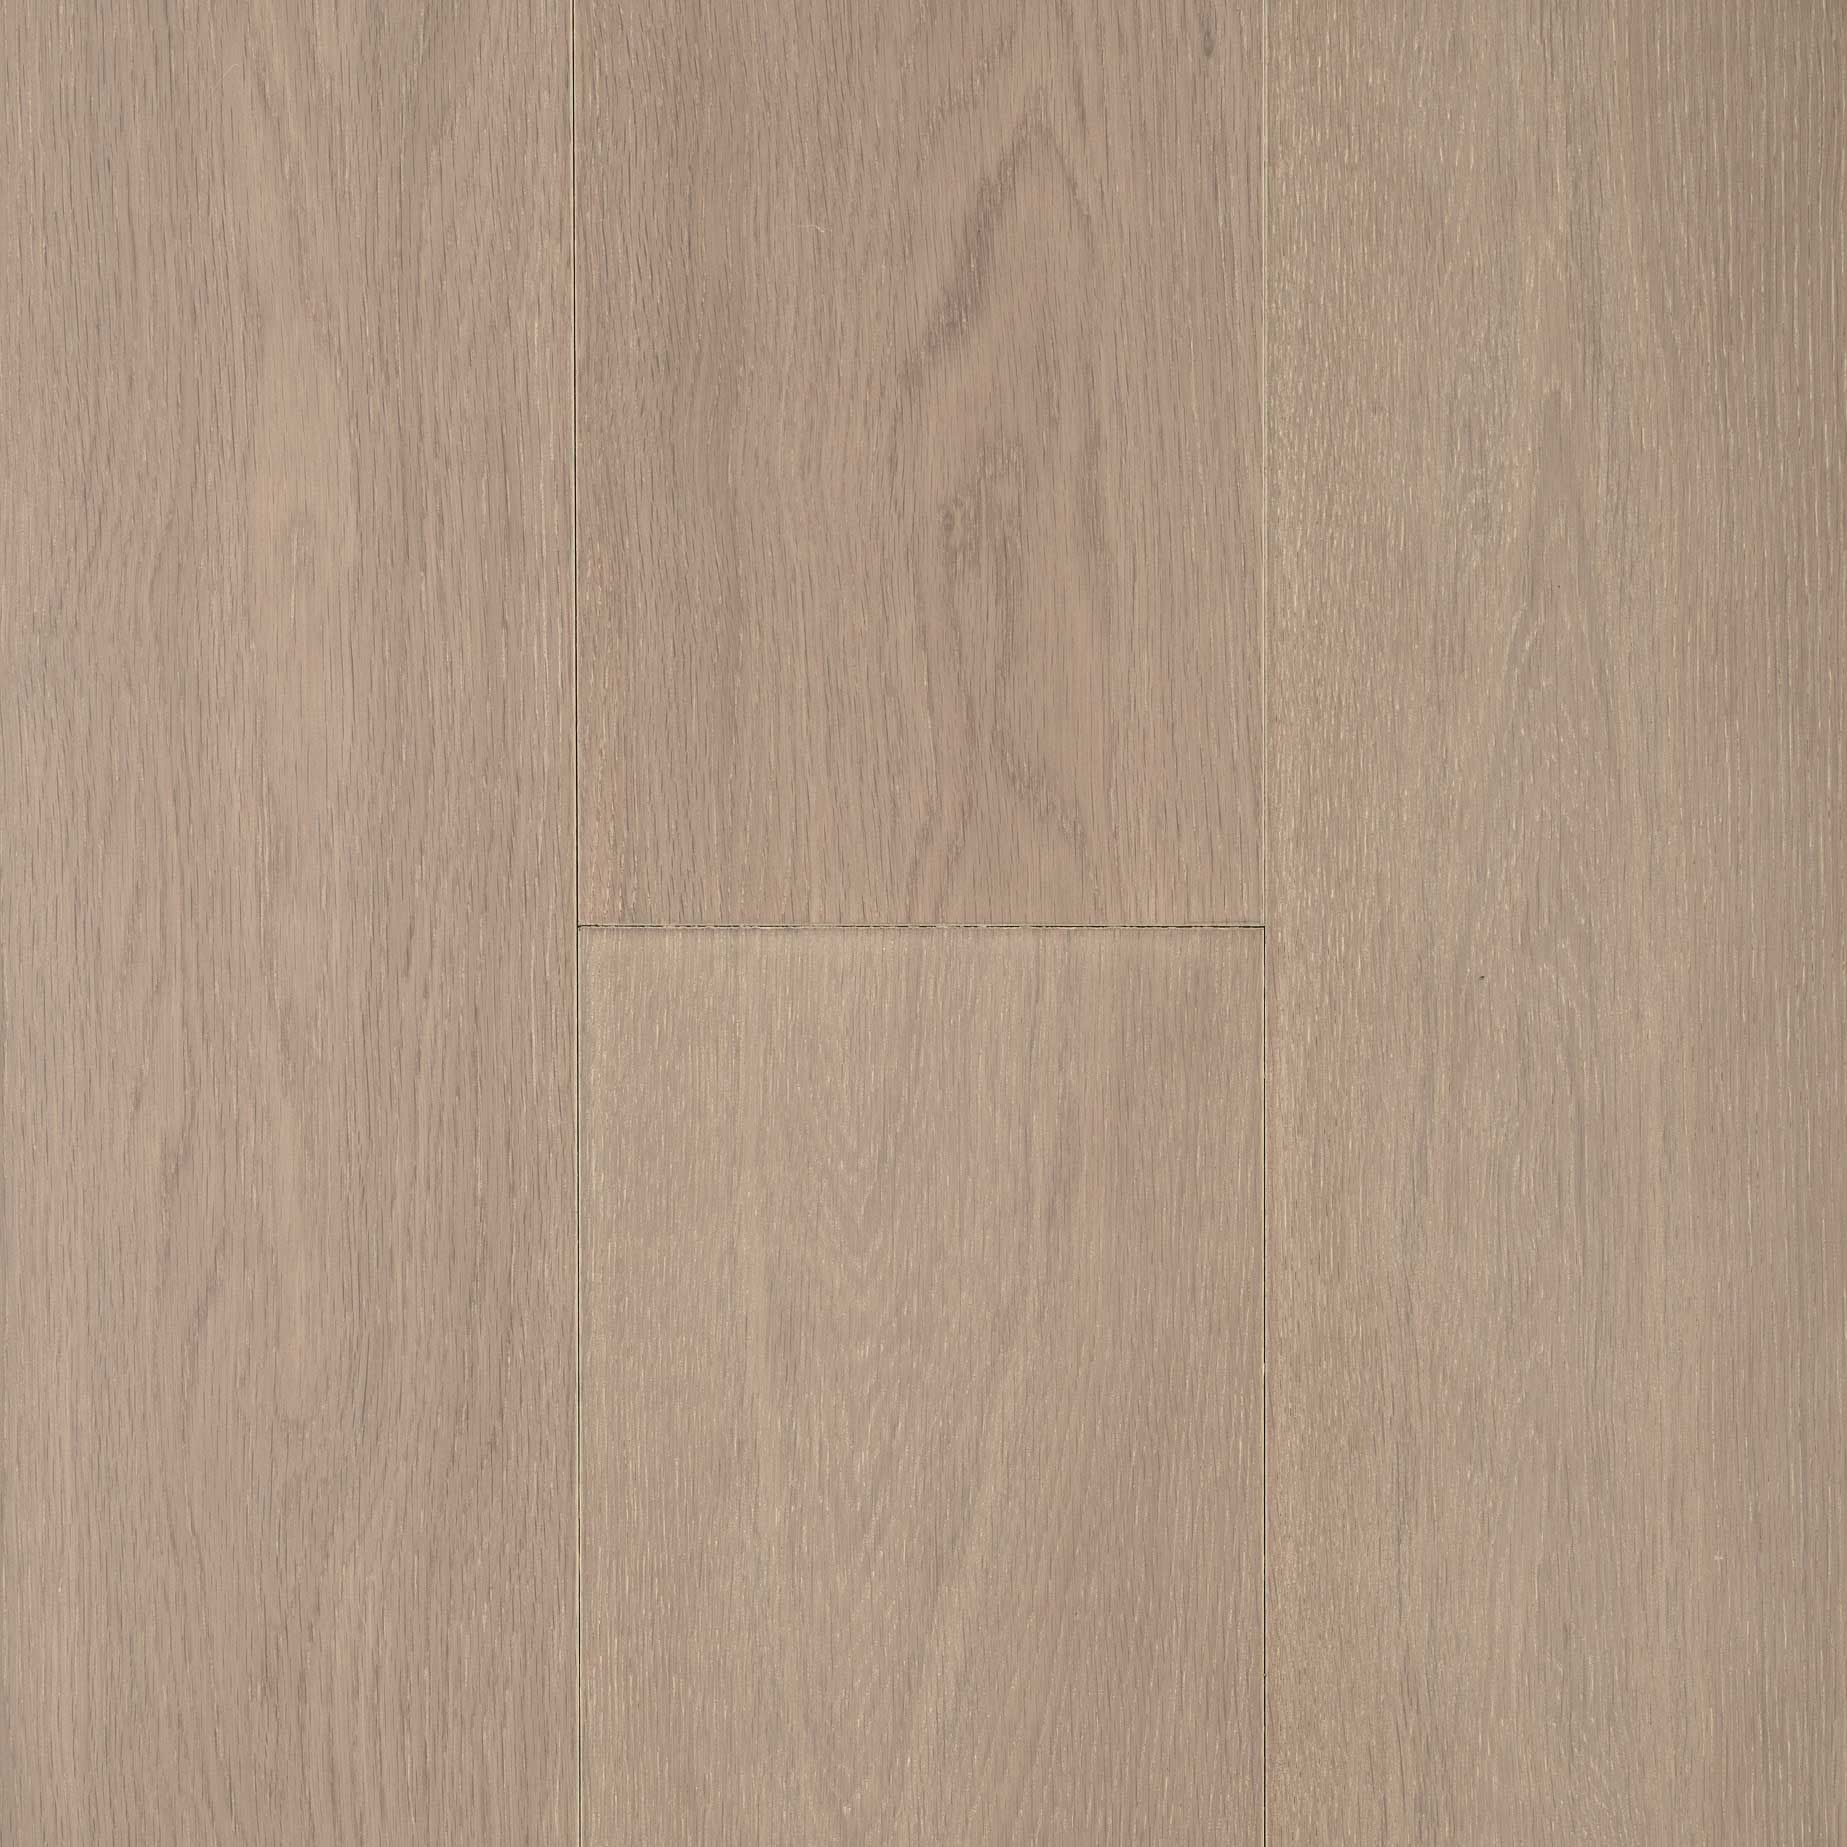 Light Grey Stone Engineered Flooring Grey Hardwood Floors